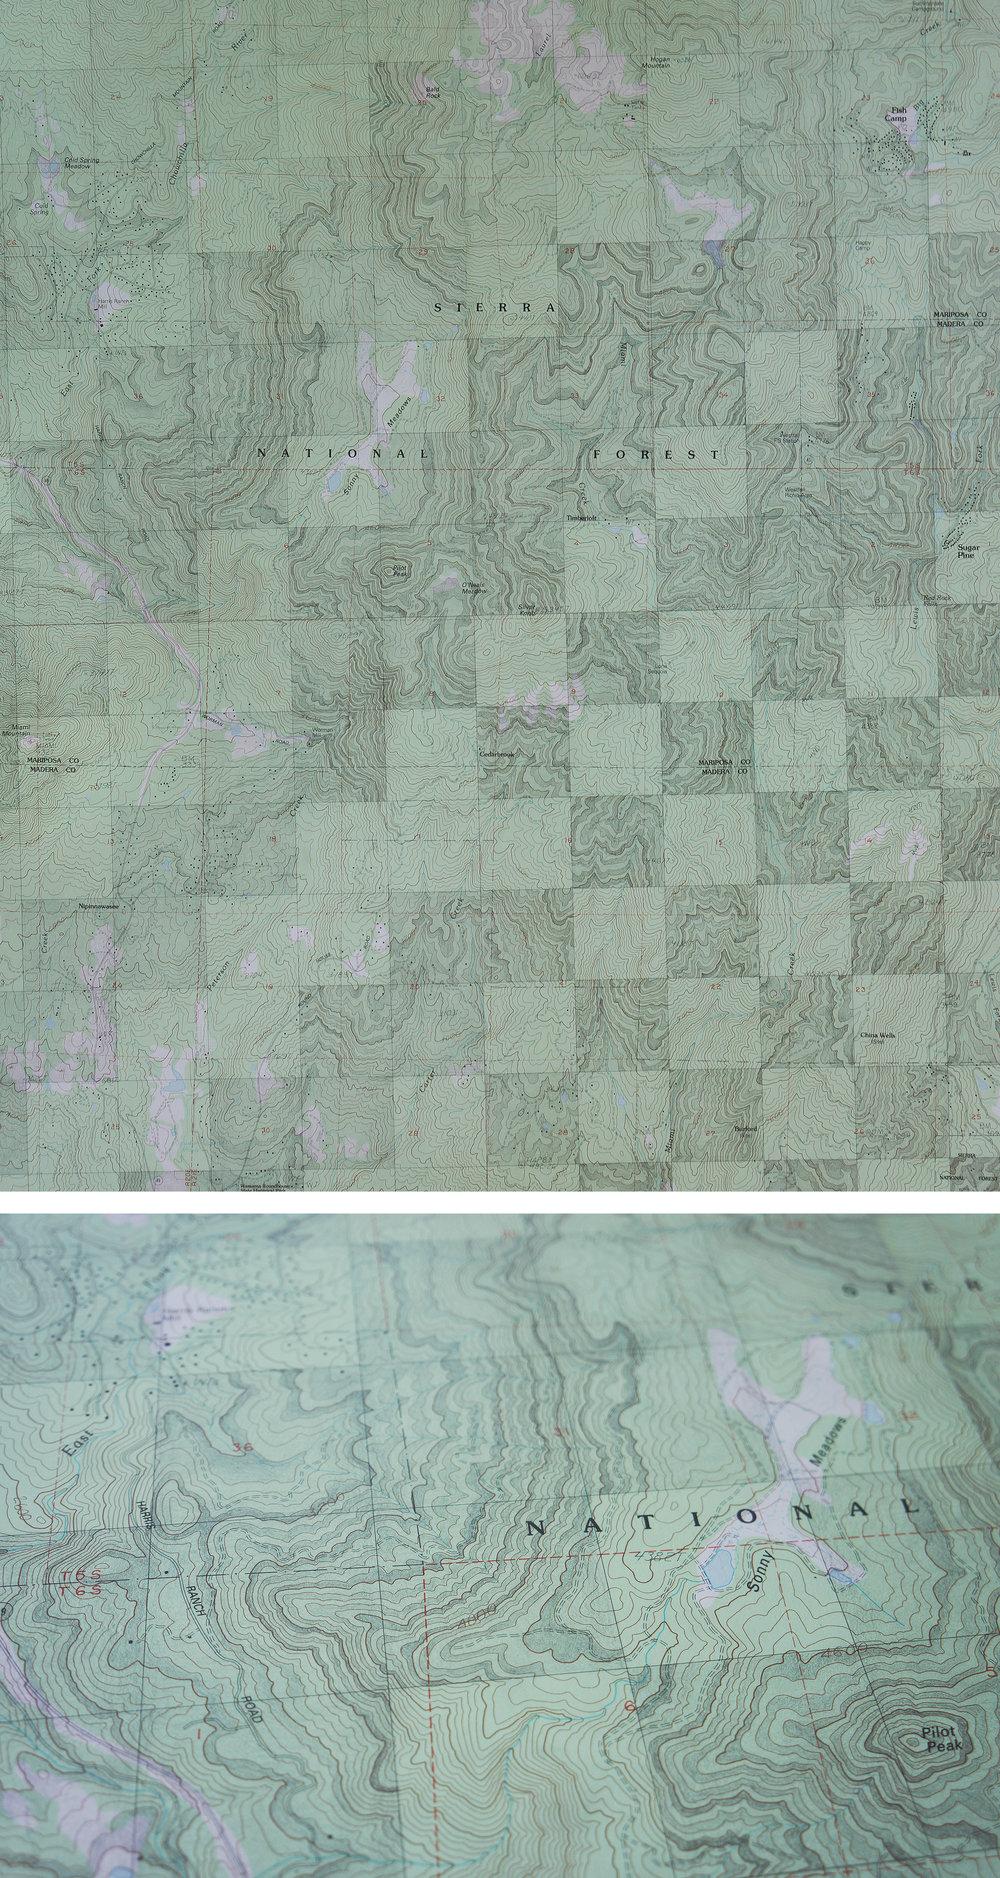 Catherine Reinhart_Textiles + Topography:Sampler